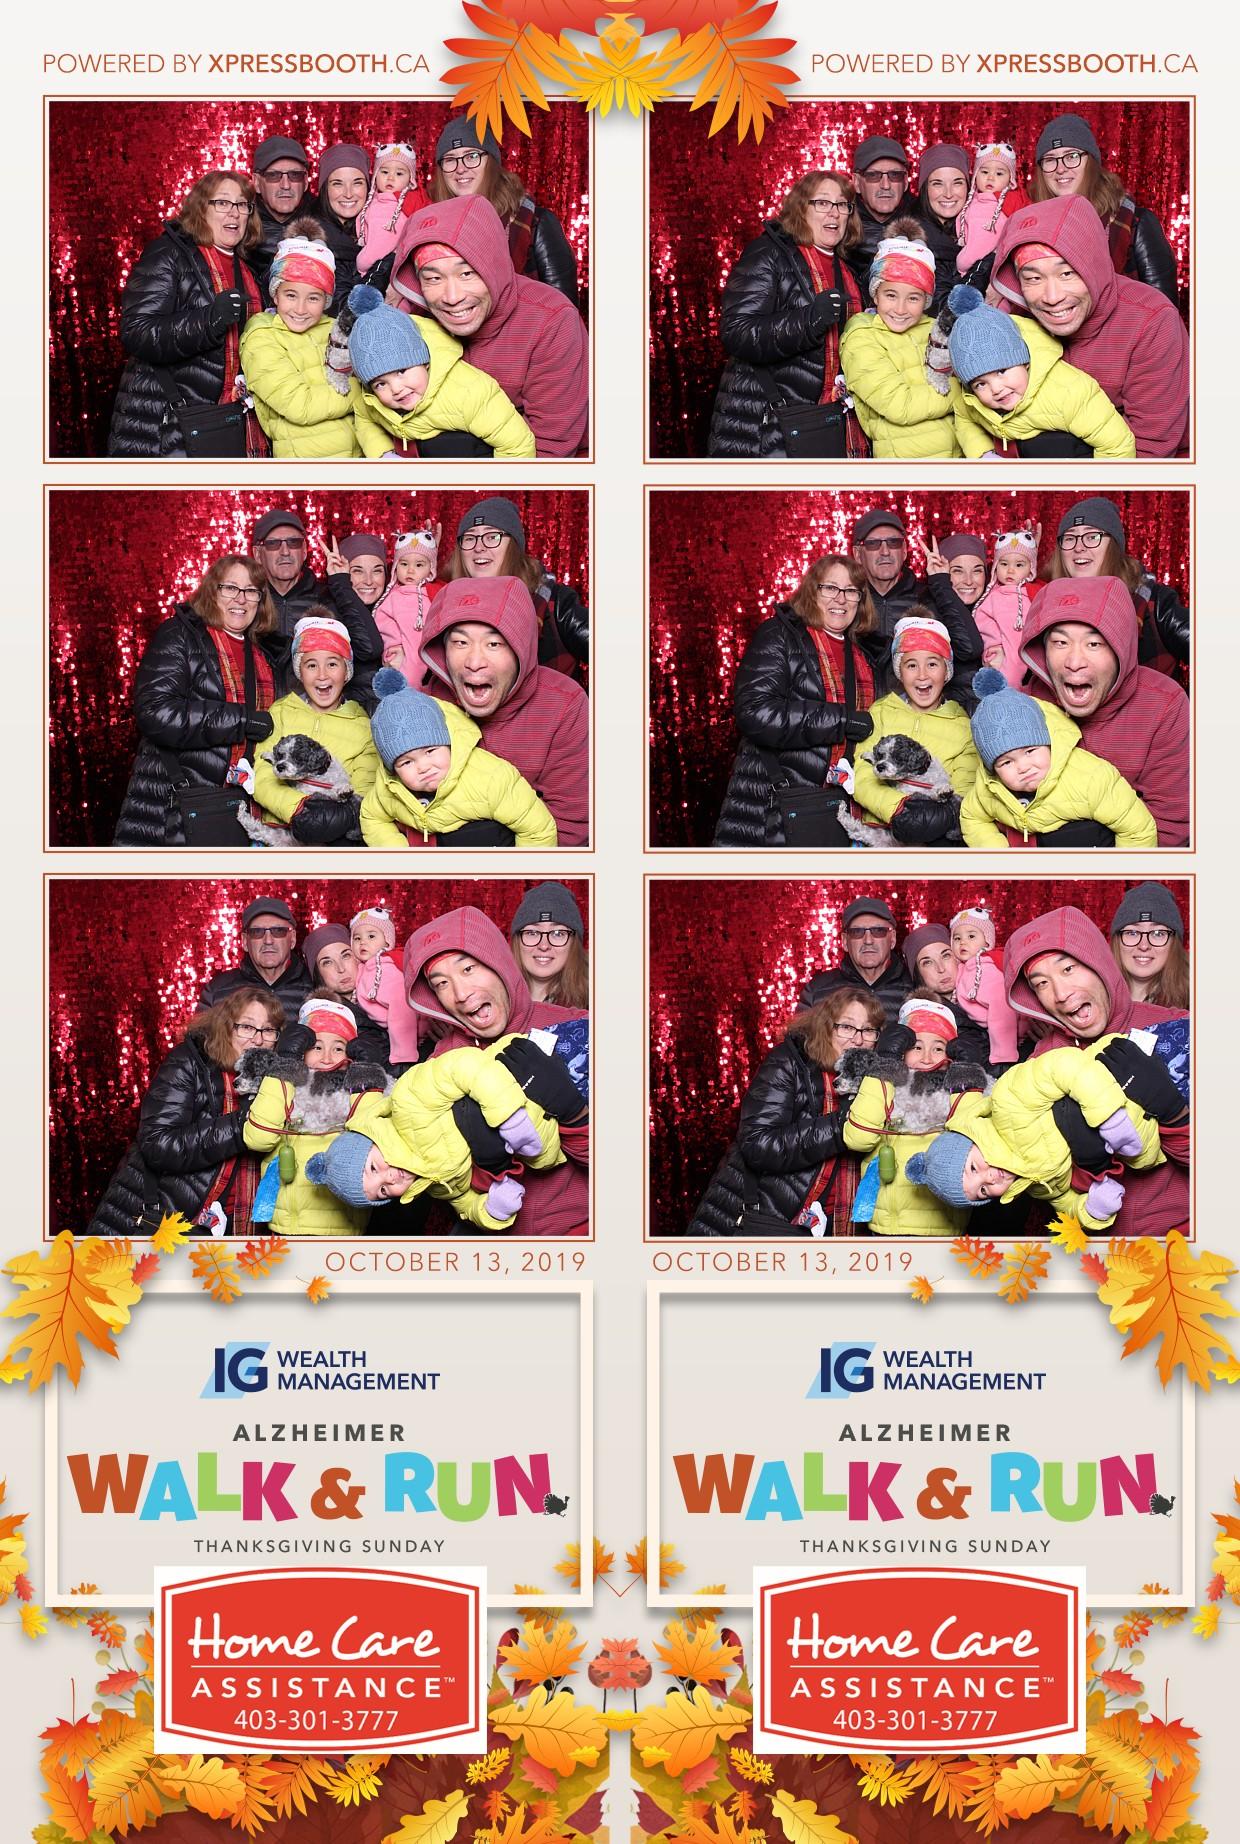 WalkRunAlzheimerSociety-0112-PRINT